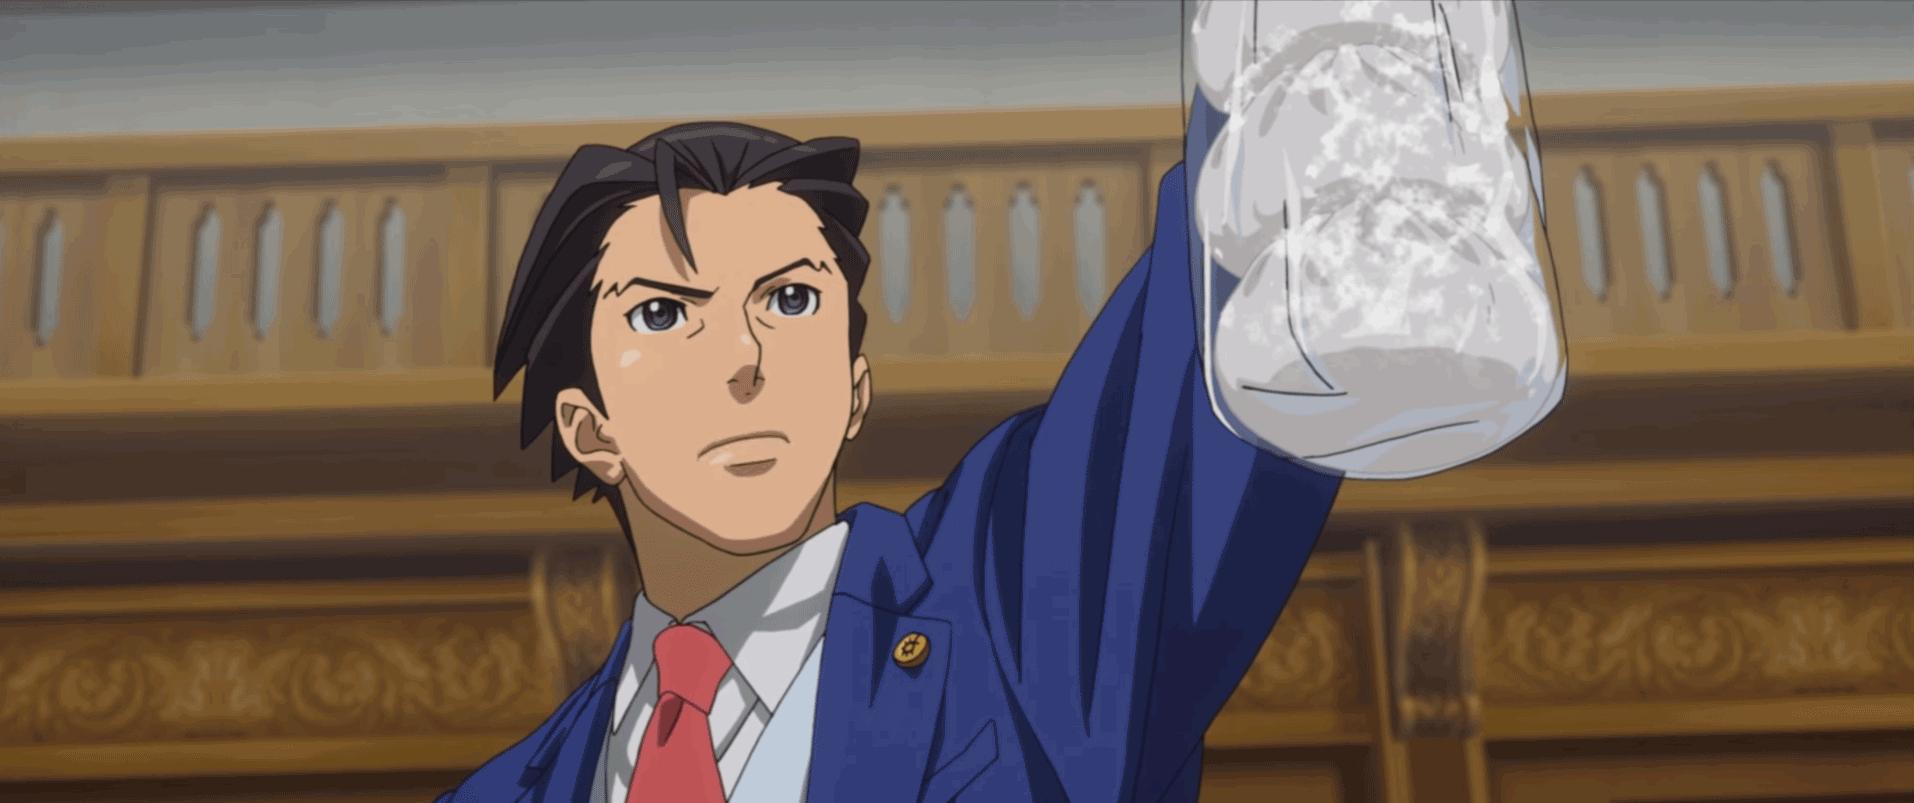 Phoenix Wright: Ace Attorney - Spirit of Justice prologue trailer, these pork buns were frozen - Neoseeker